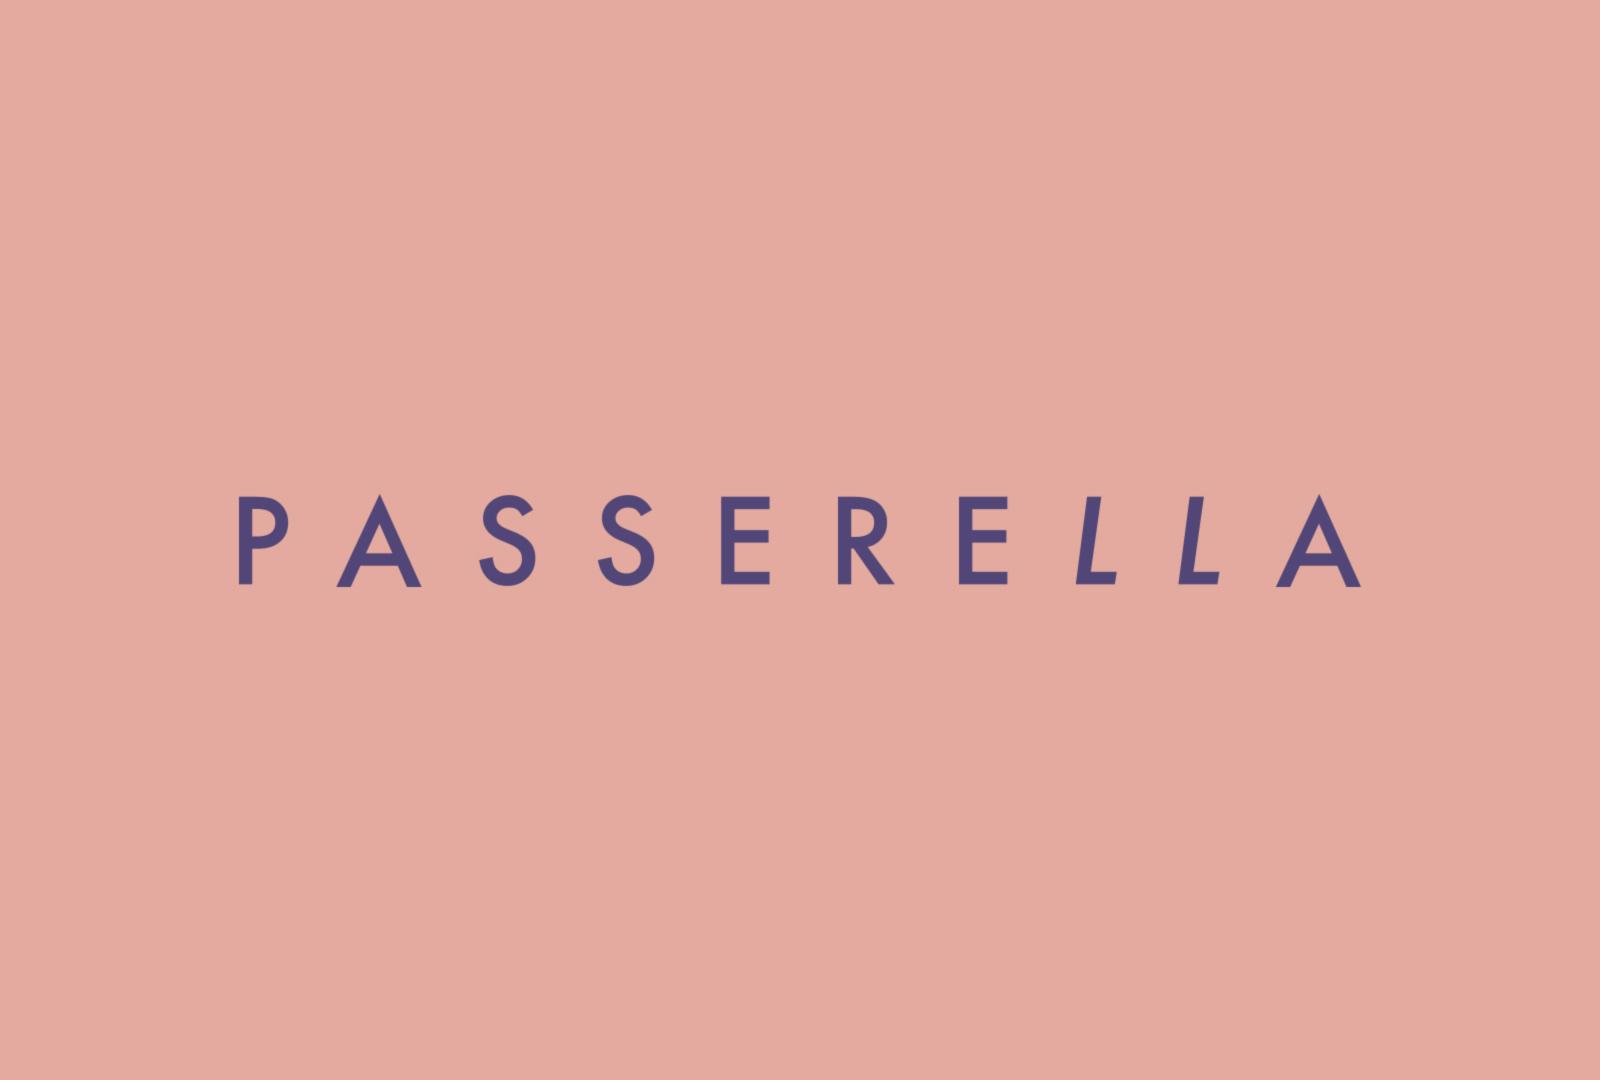 PASSERELLA_1600108001